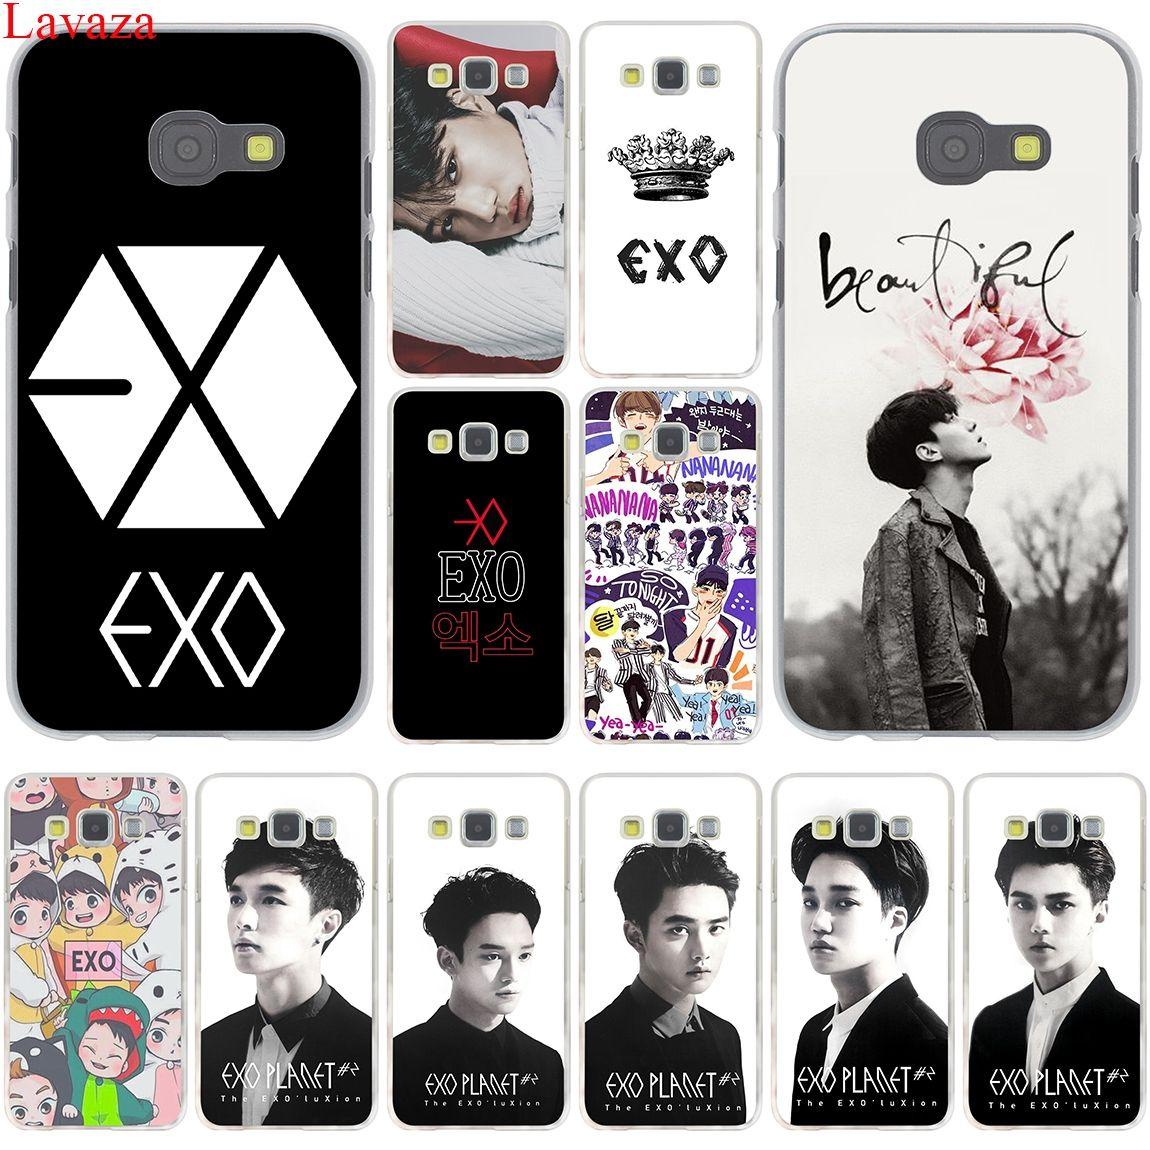 kpop samsung s8 phone case